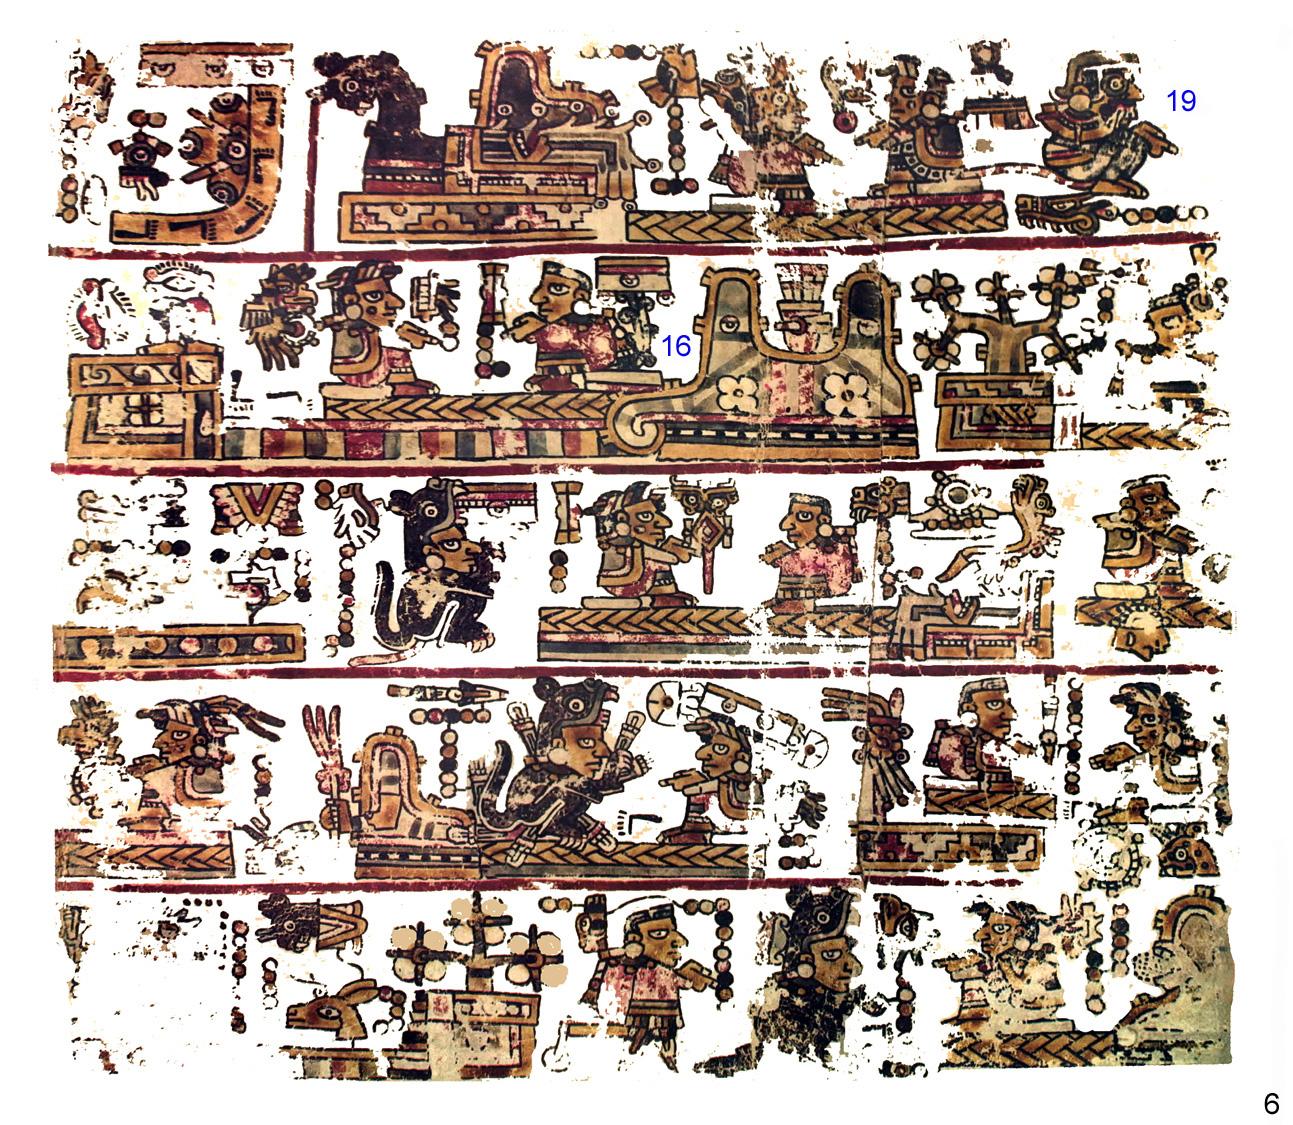 FAMSI - John Pohl's - Ancient Books - Mixtec Group Codices - Codex